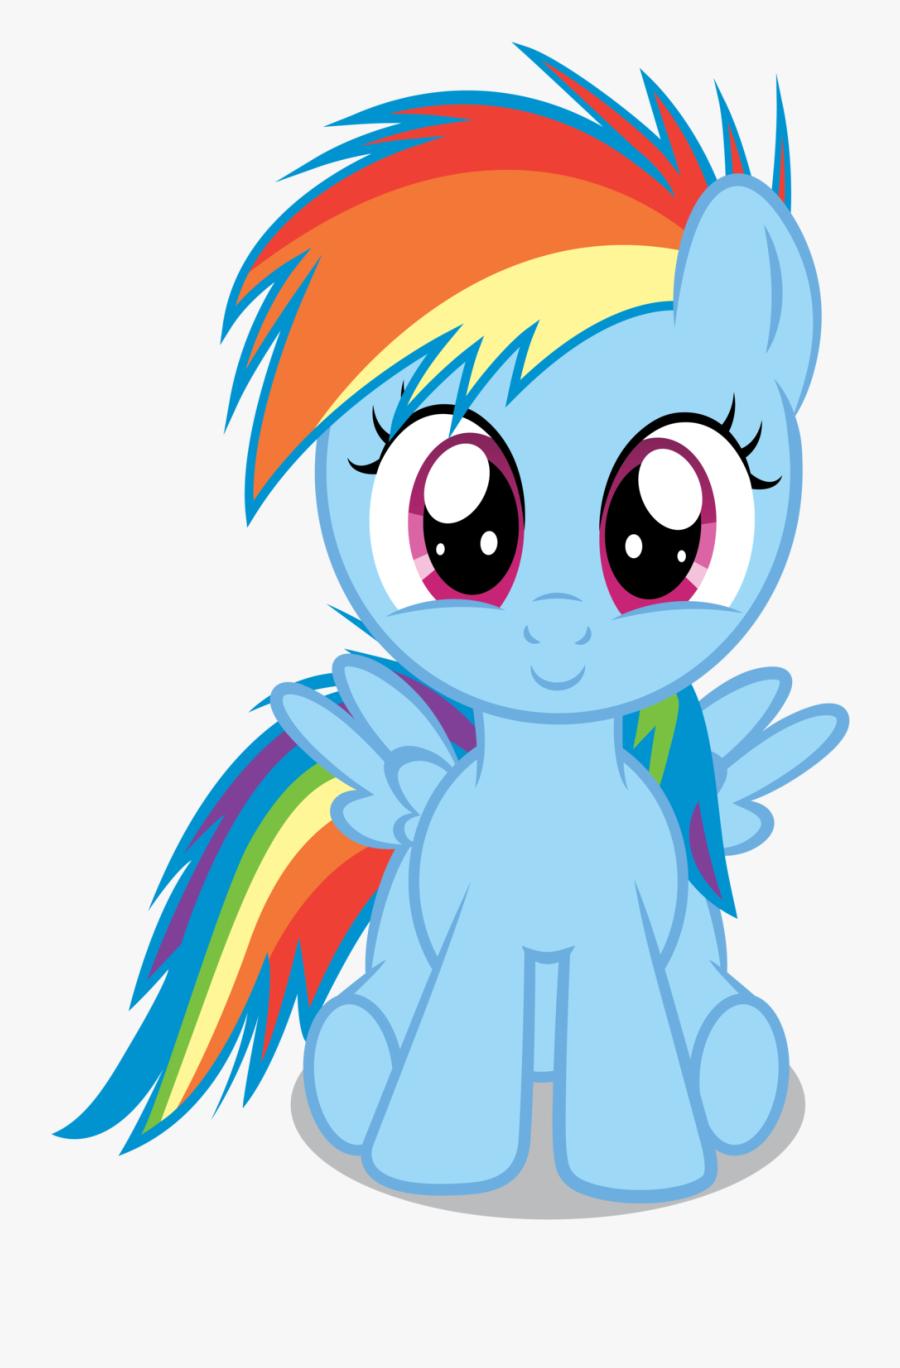 Rainbow Dash Rarity Applejack Pinkie Pie Twilight Sparkle - Rainbow Dash Filly, Transparent Clipart